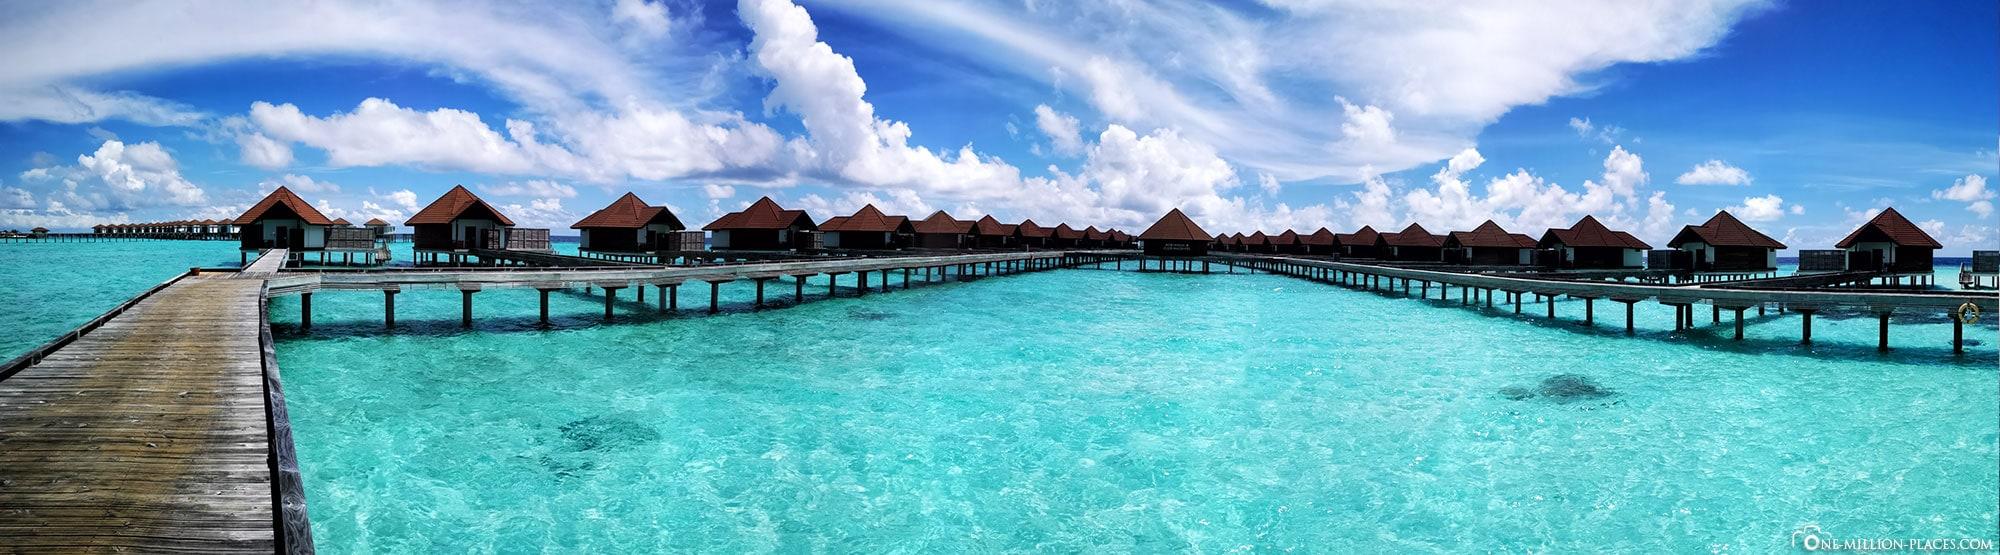 Panoramic view, Water Bungalow, Overwater Bungalow, BUM2, ROBINSON Club Maldives, Maldives, Gaaf Alif Atoll, Travelreport